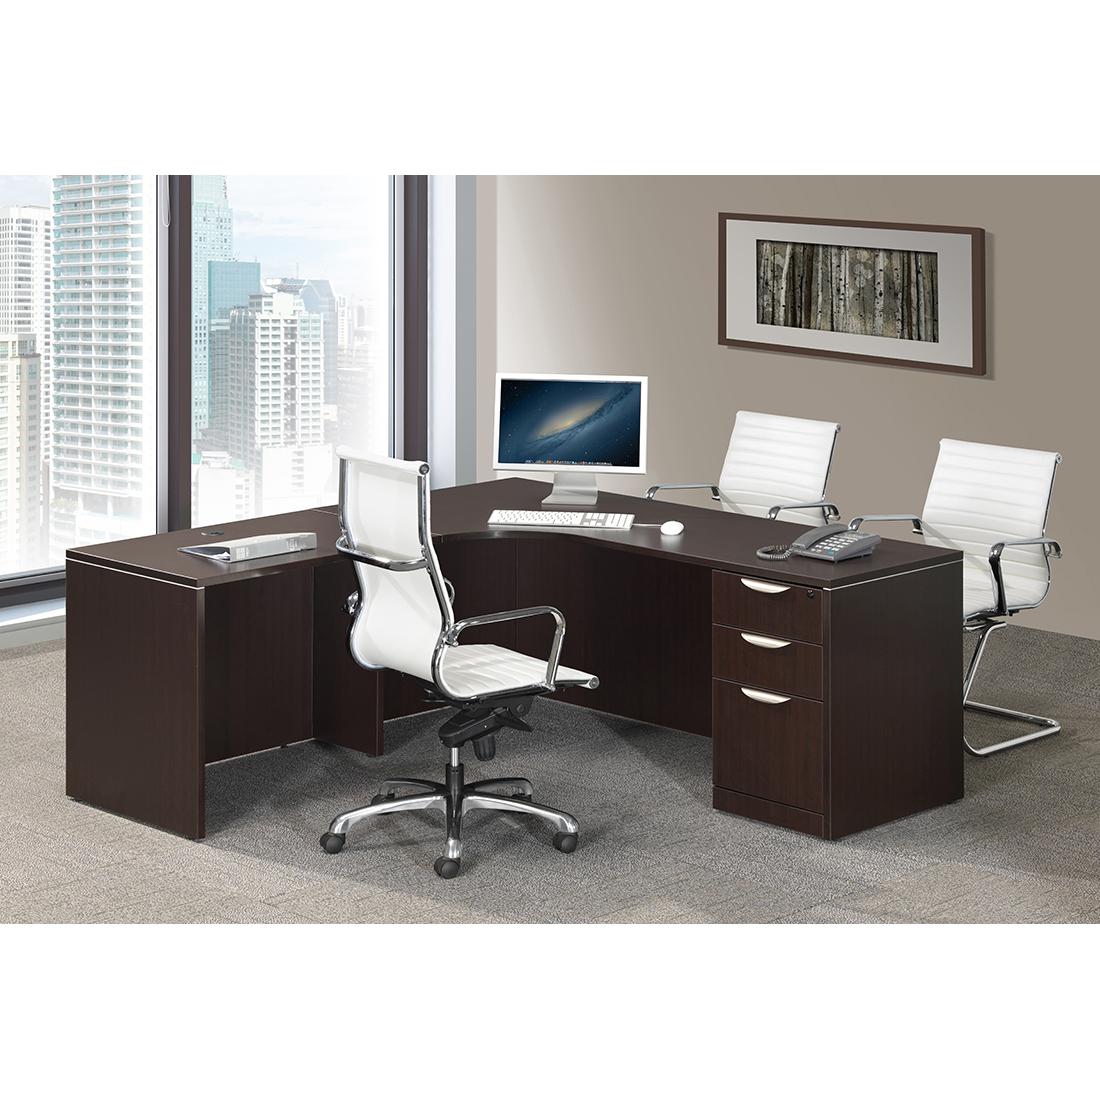 9b Starkamp Bnn Office Furniture